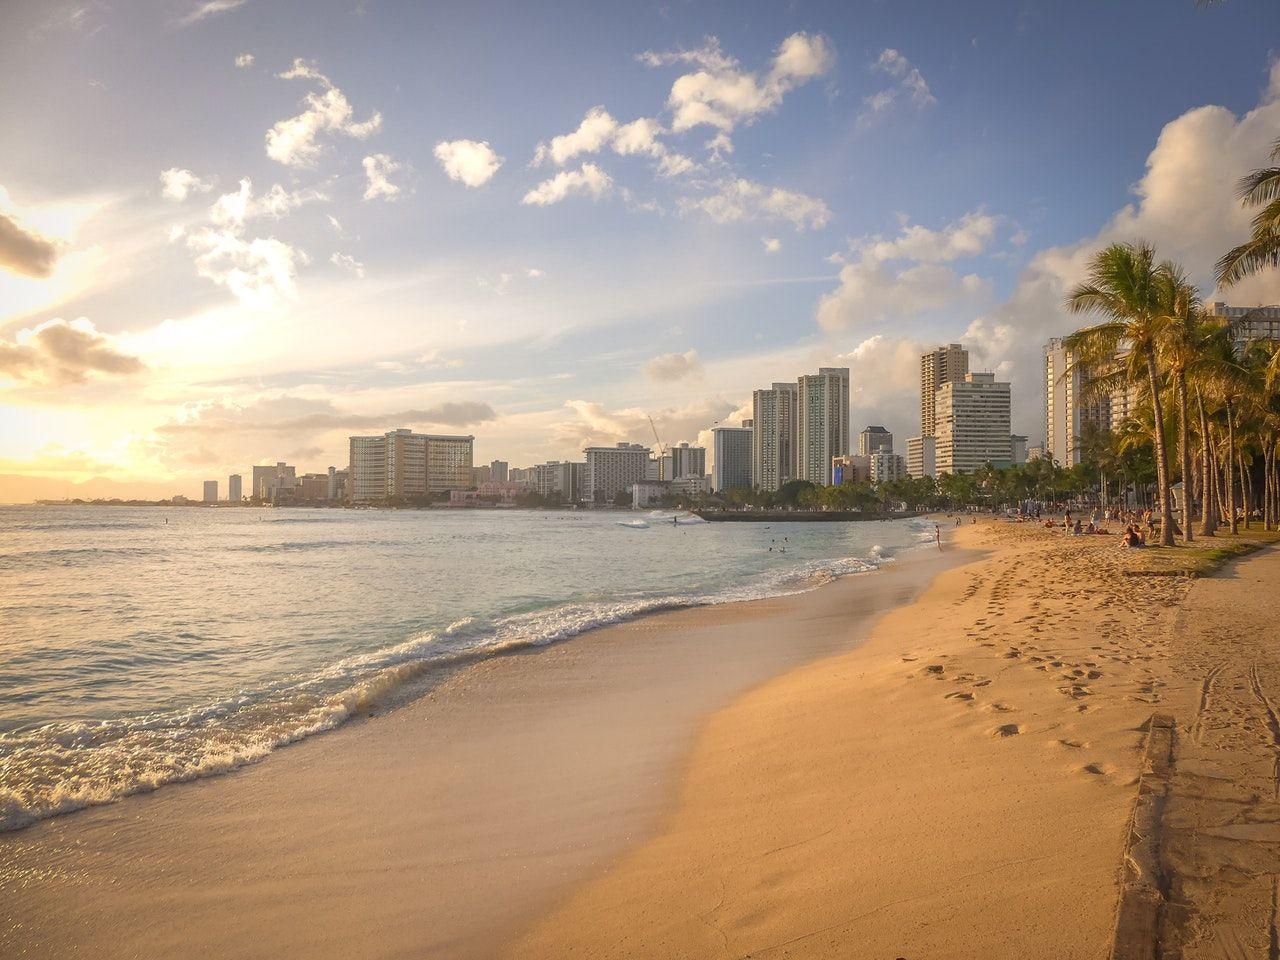 Hawaii gets its own medical marijuana dispensary